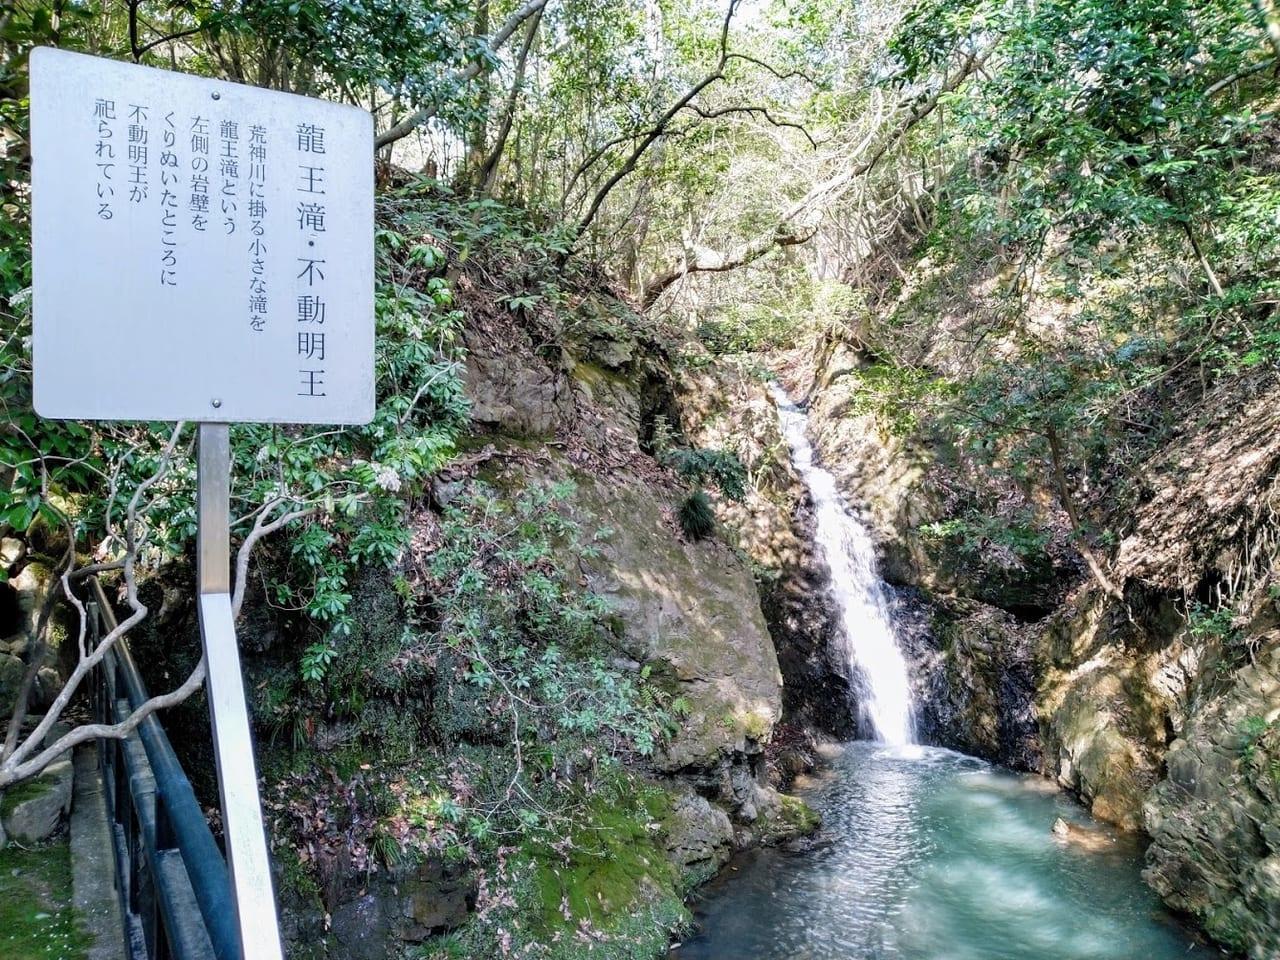 清荒神清澄寺の龍王滝